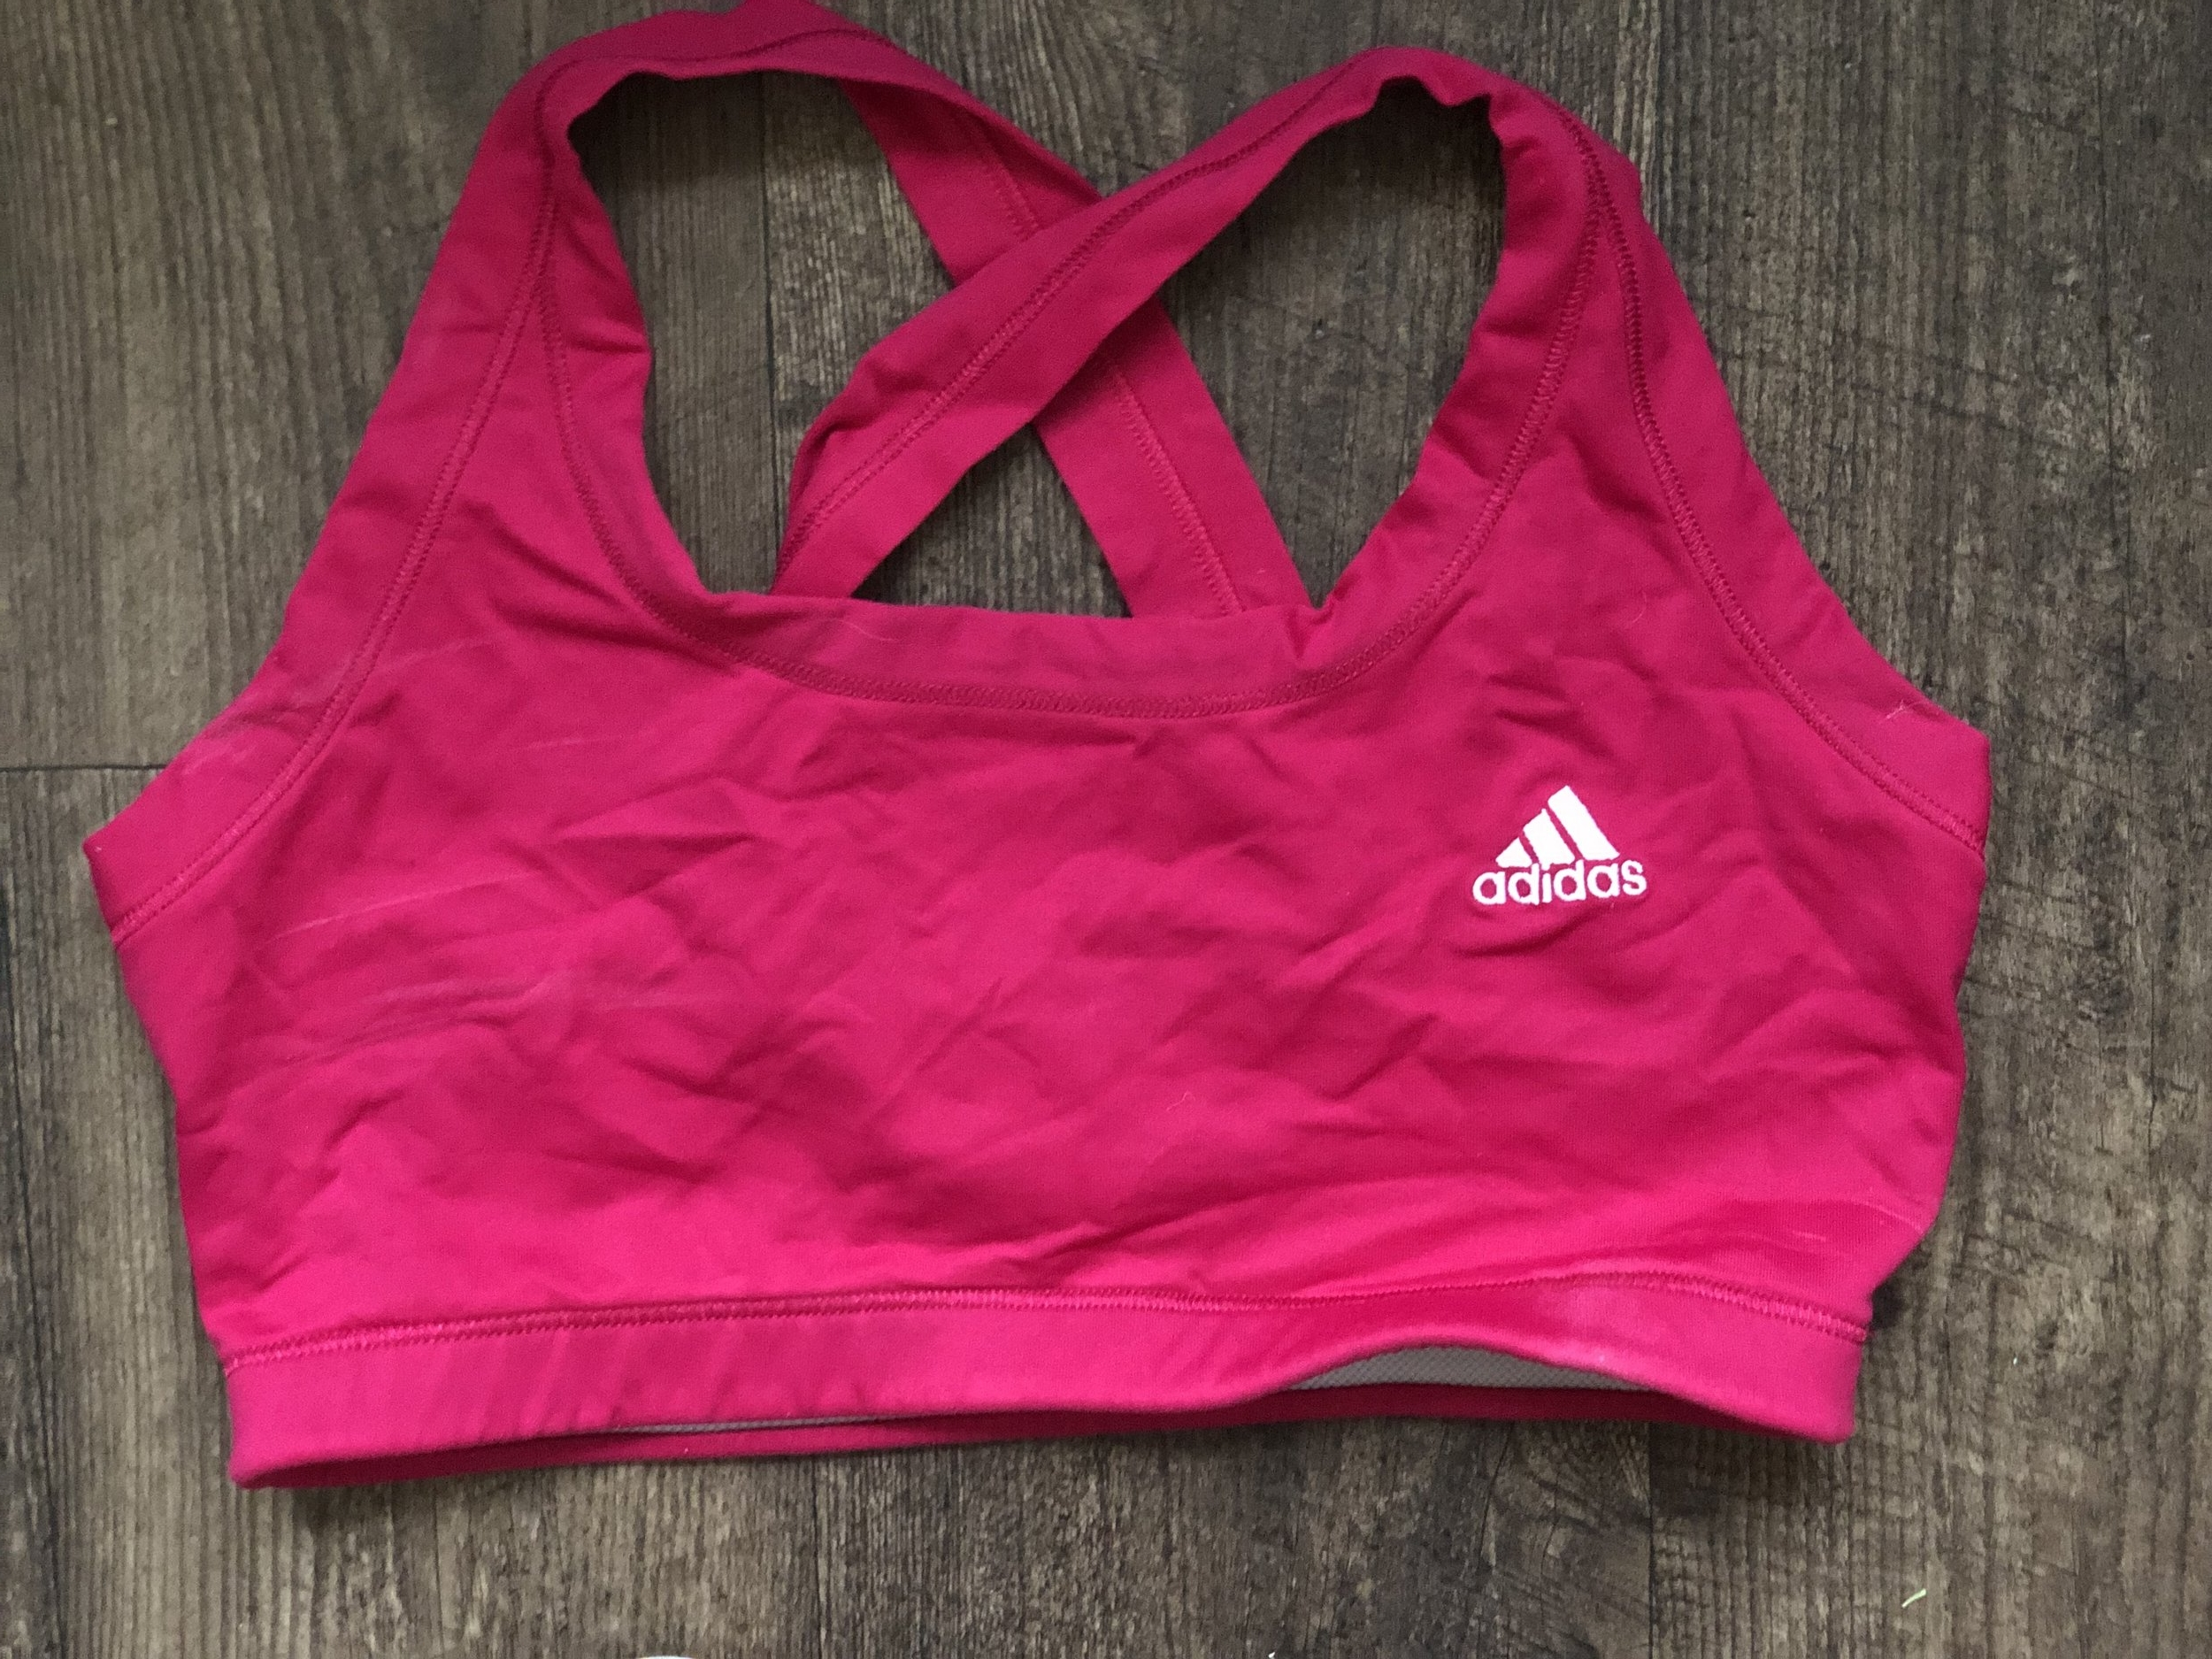 Adidas Yoga Bra // $15